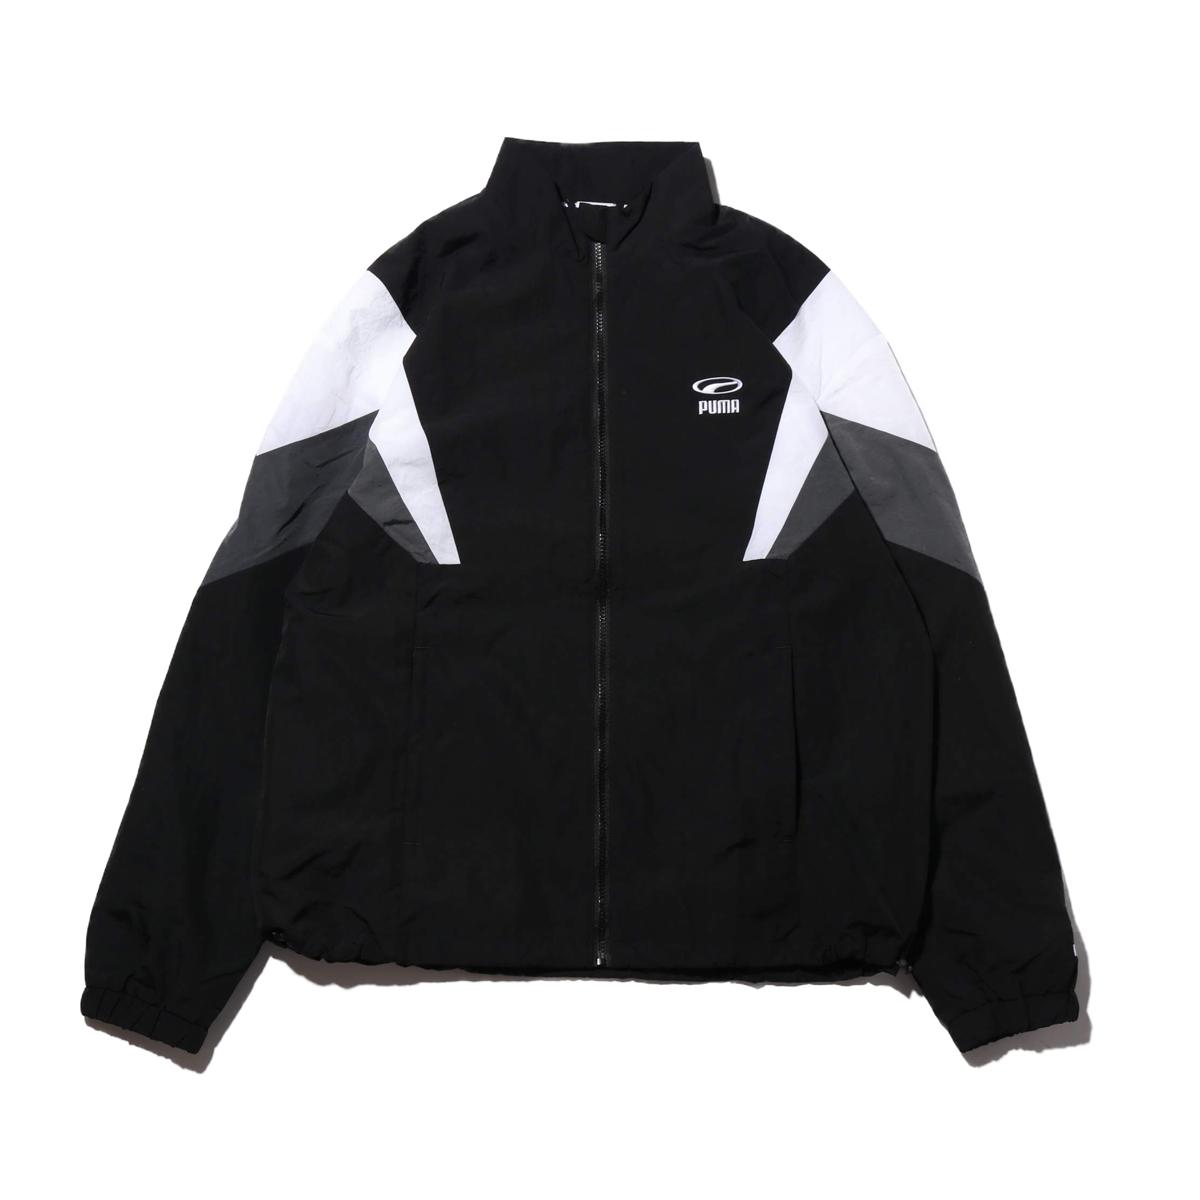 9846ce91e976 PUMA 90S RETRO WOVEN JACKET (PUMA BLACK) (Puma 90S nostalgic Woo a jacket)